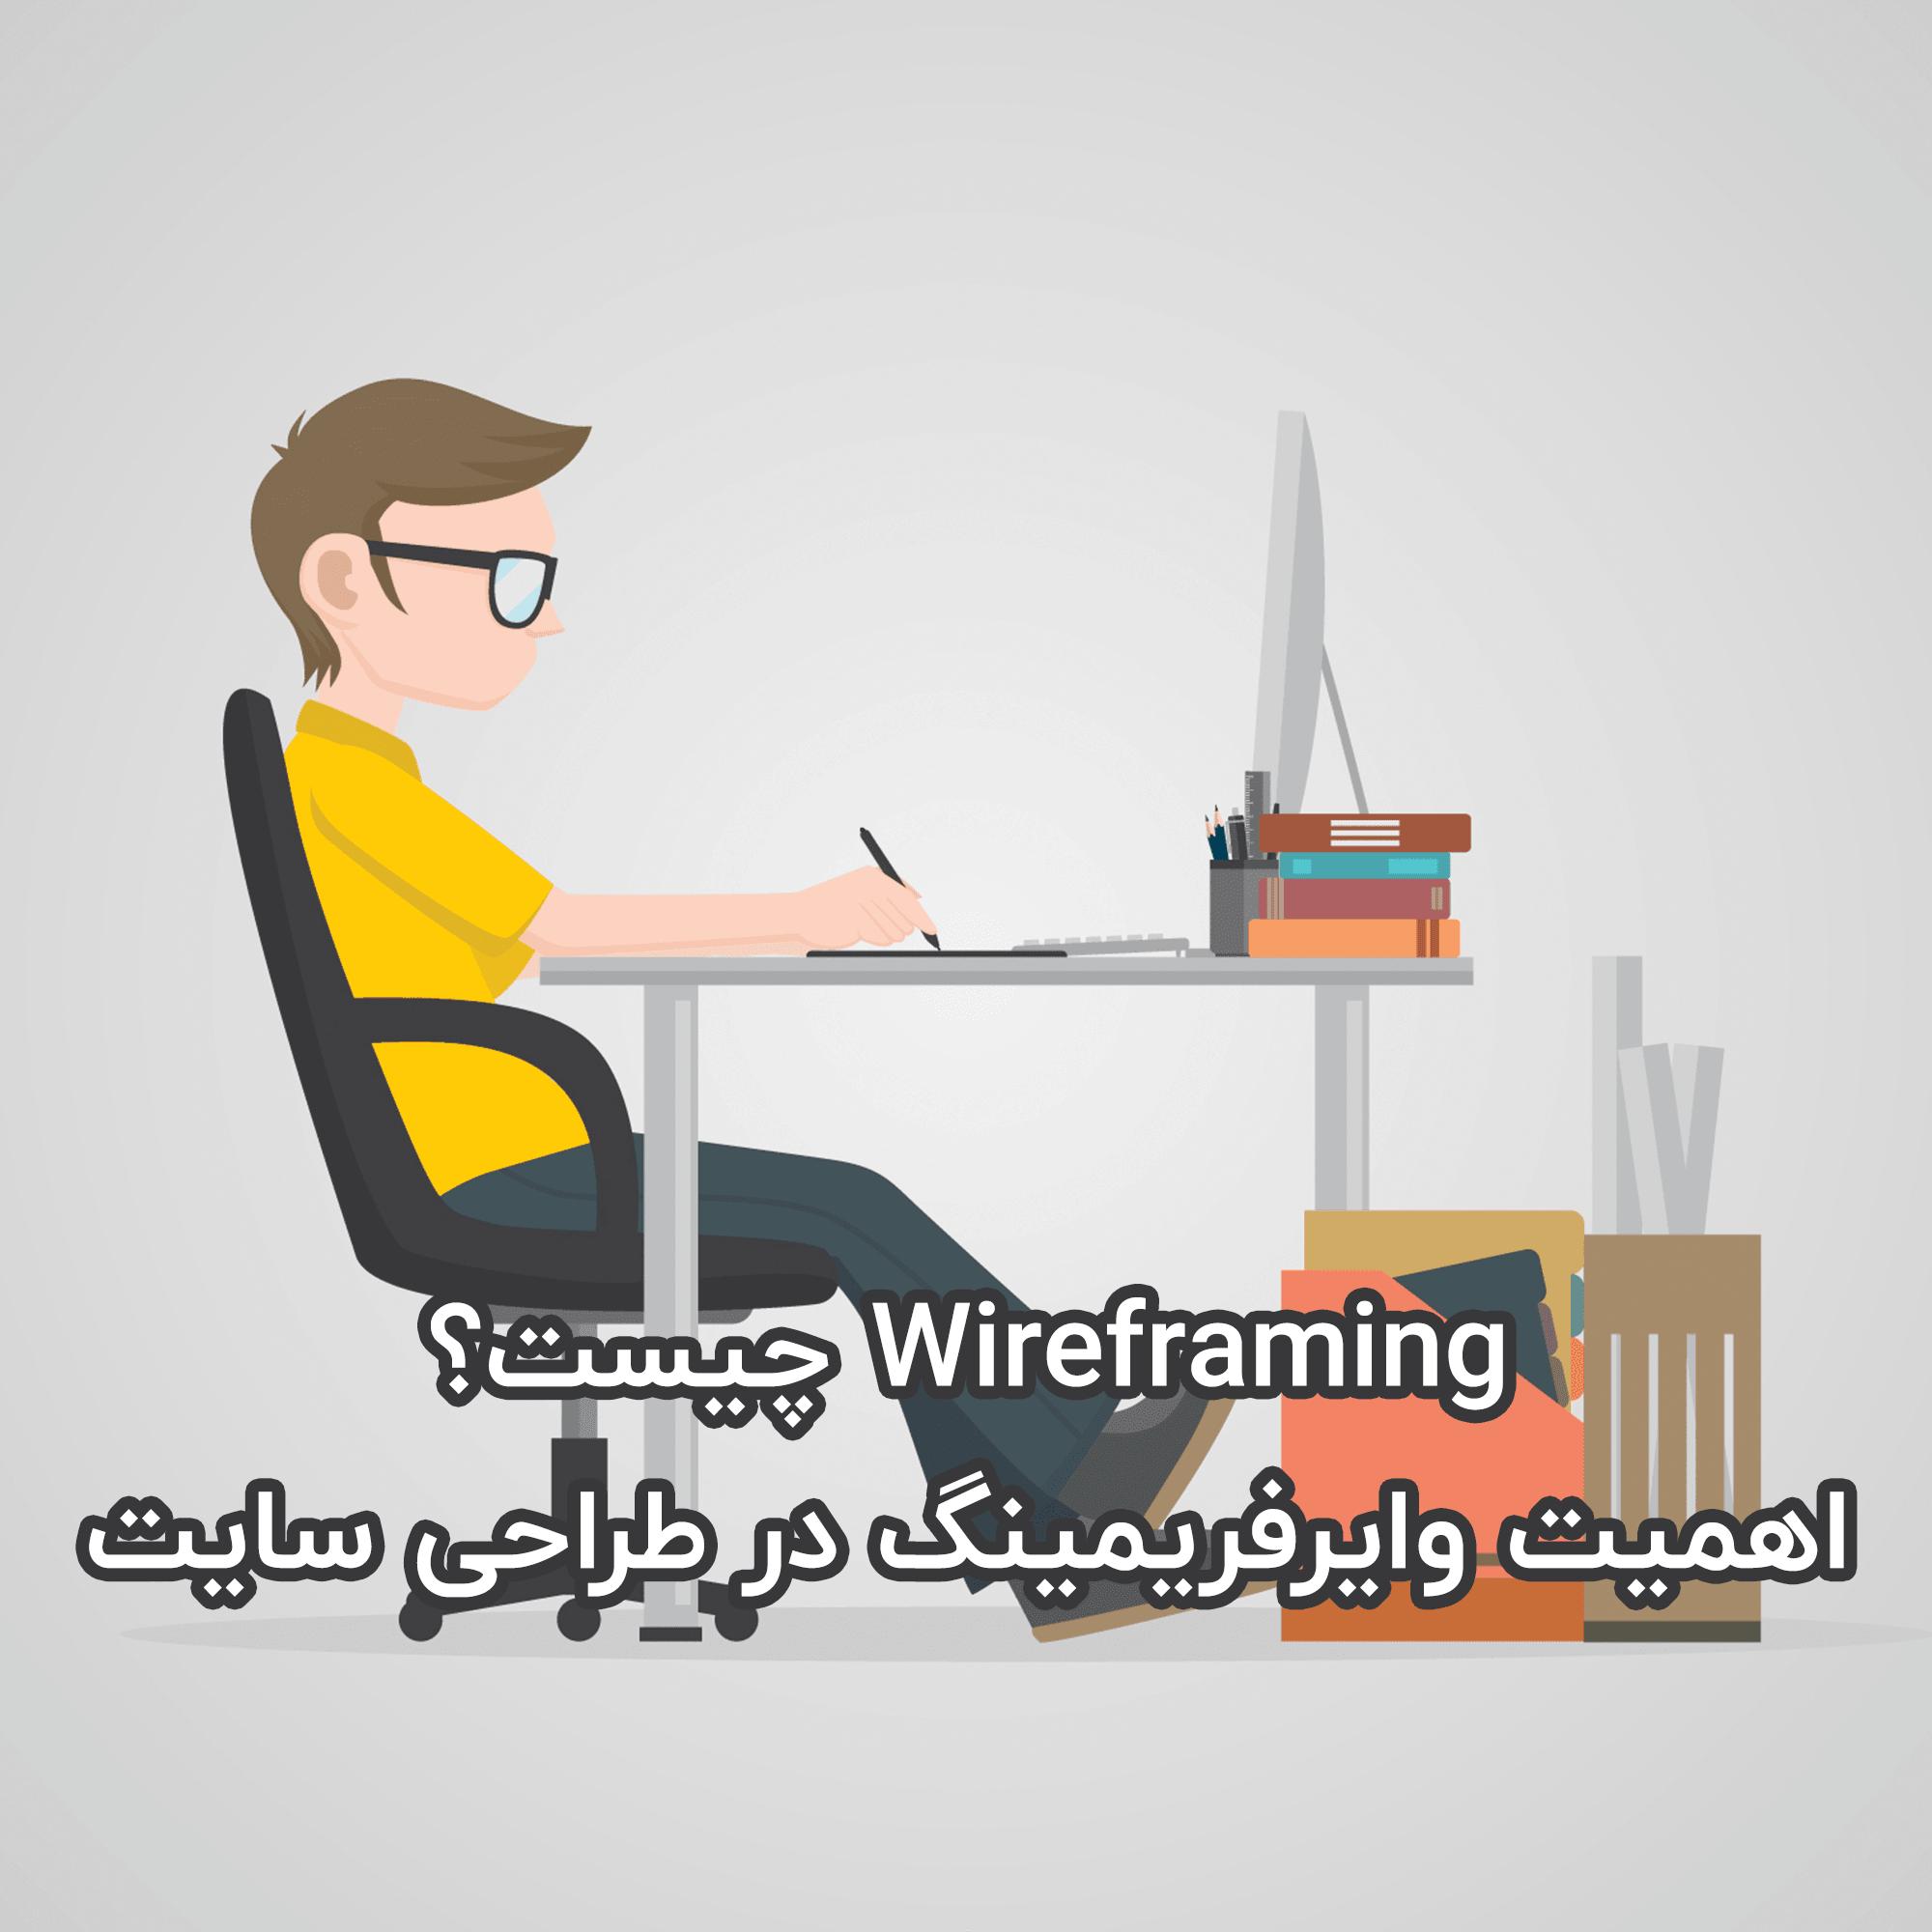 Wireframing چیست؟ چرا وایرفریمینگ در طراحی سایت مهم است؟